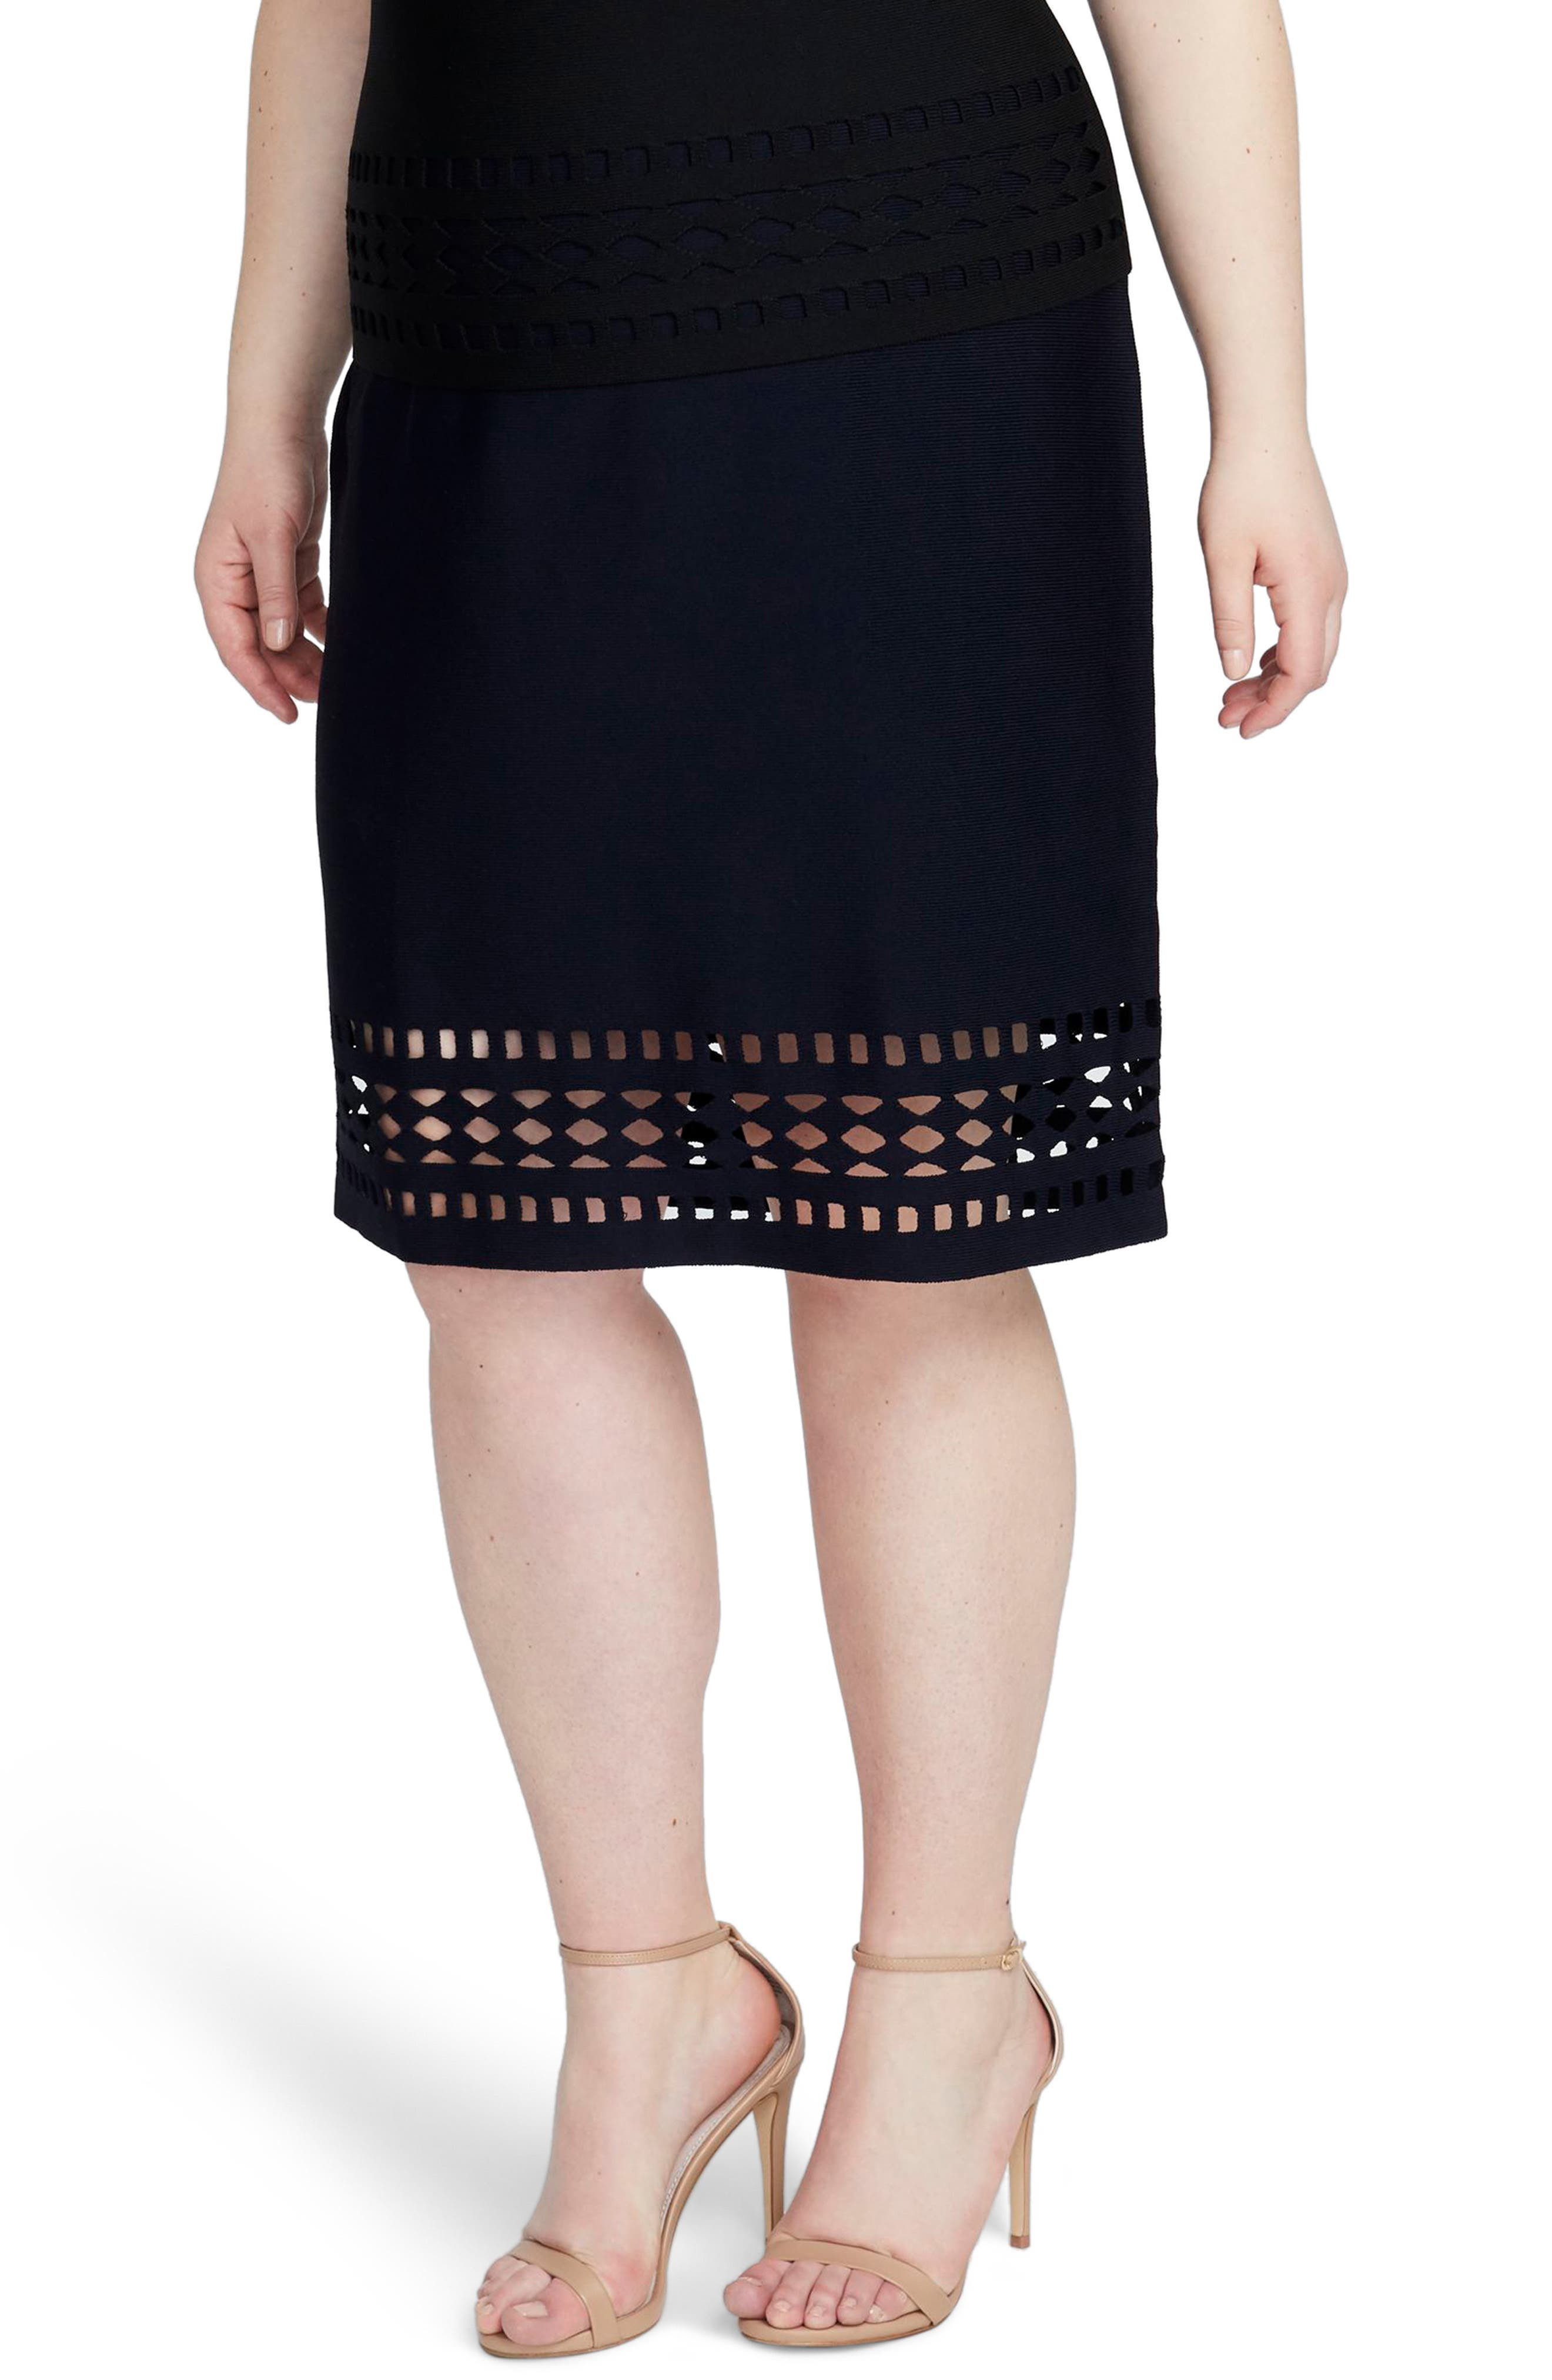 RACHEL RACHEL ROY, Cutout Knit Skirt, Main thumbnail 1, color, 001